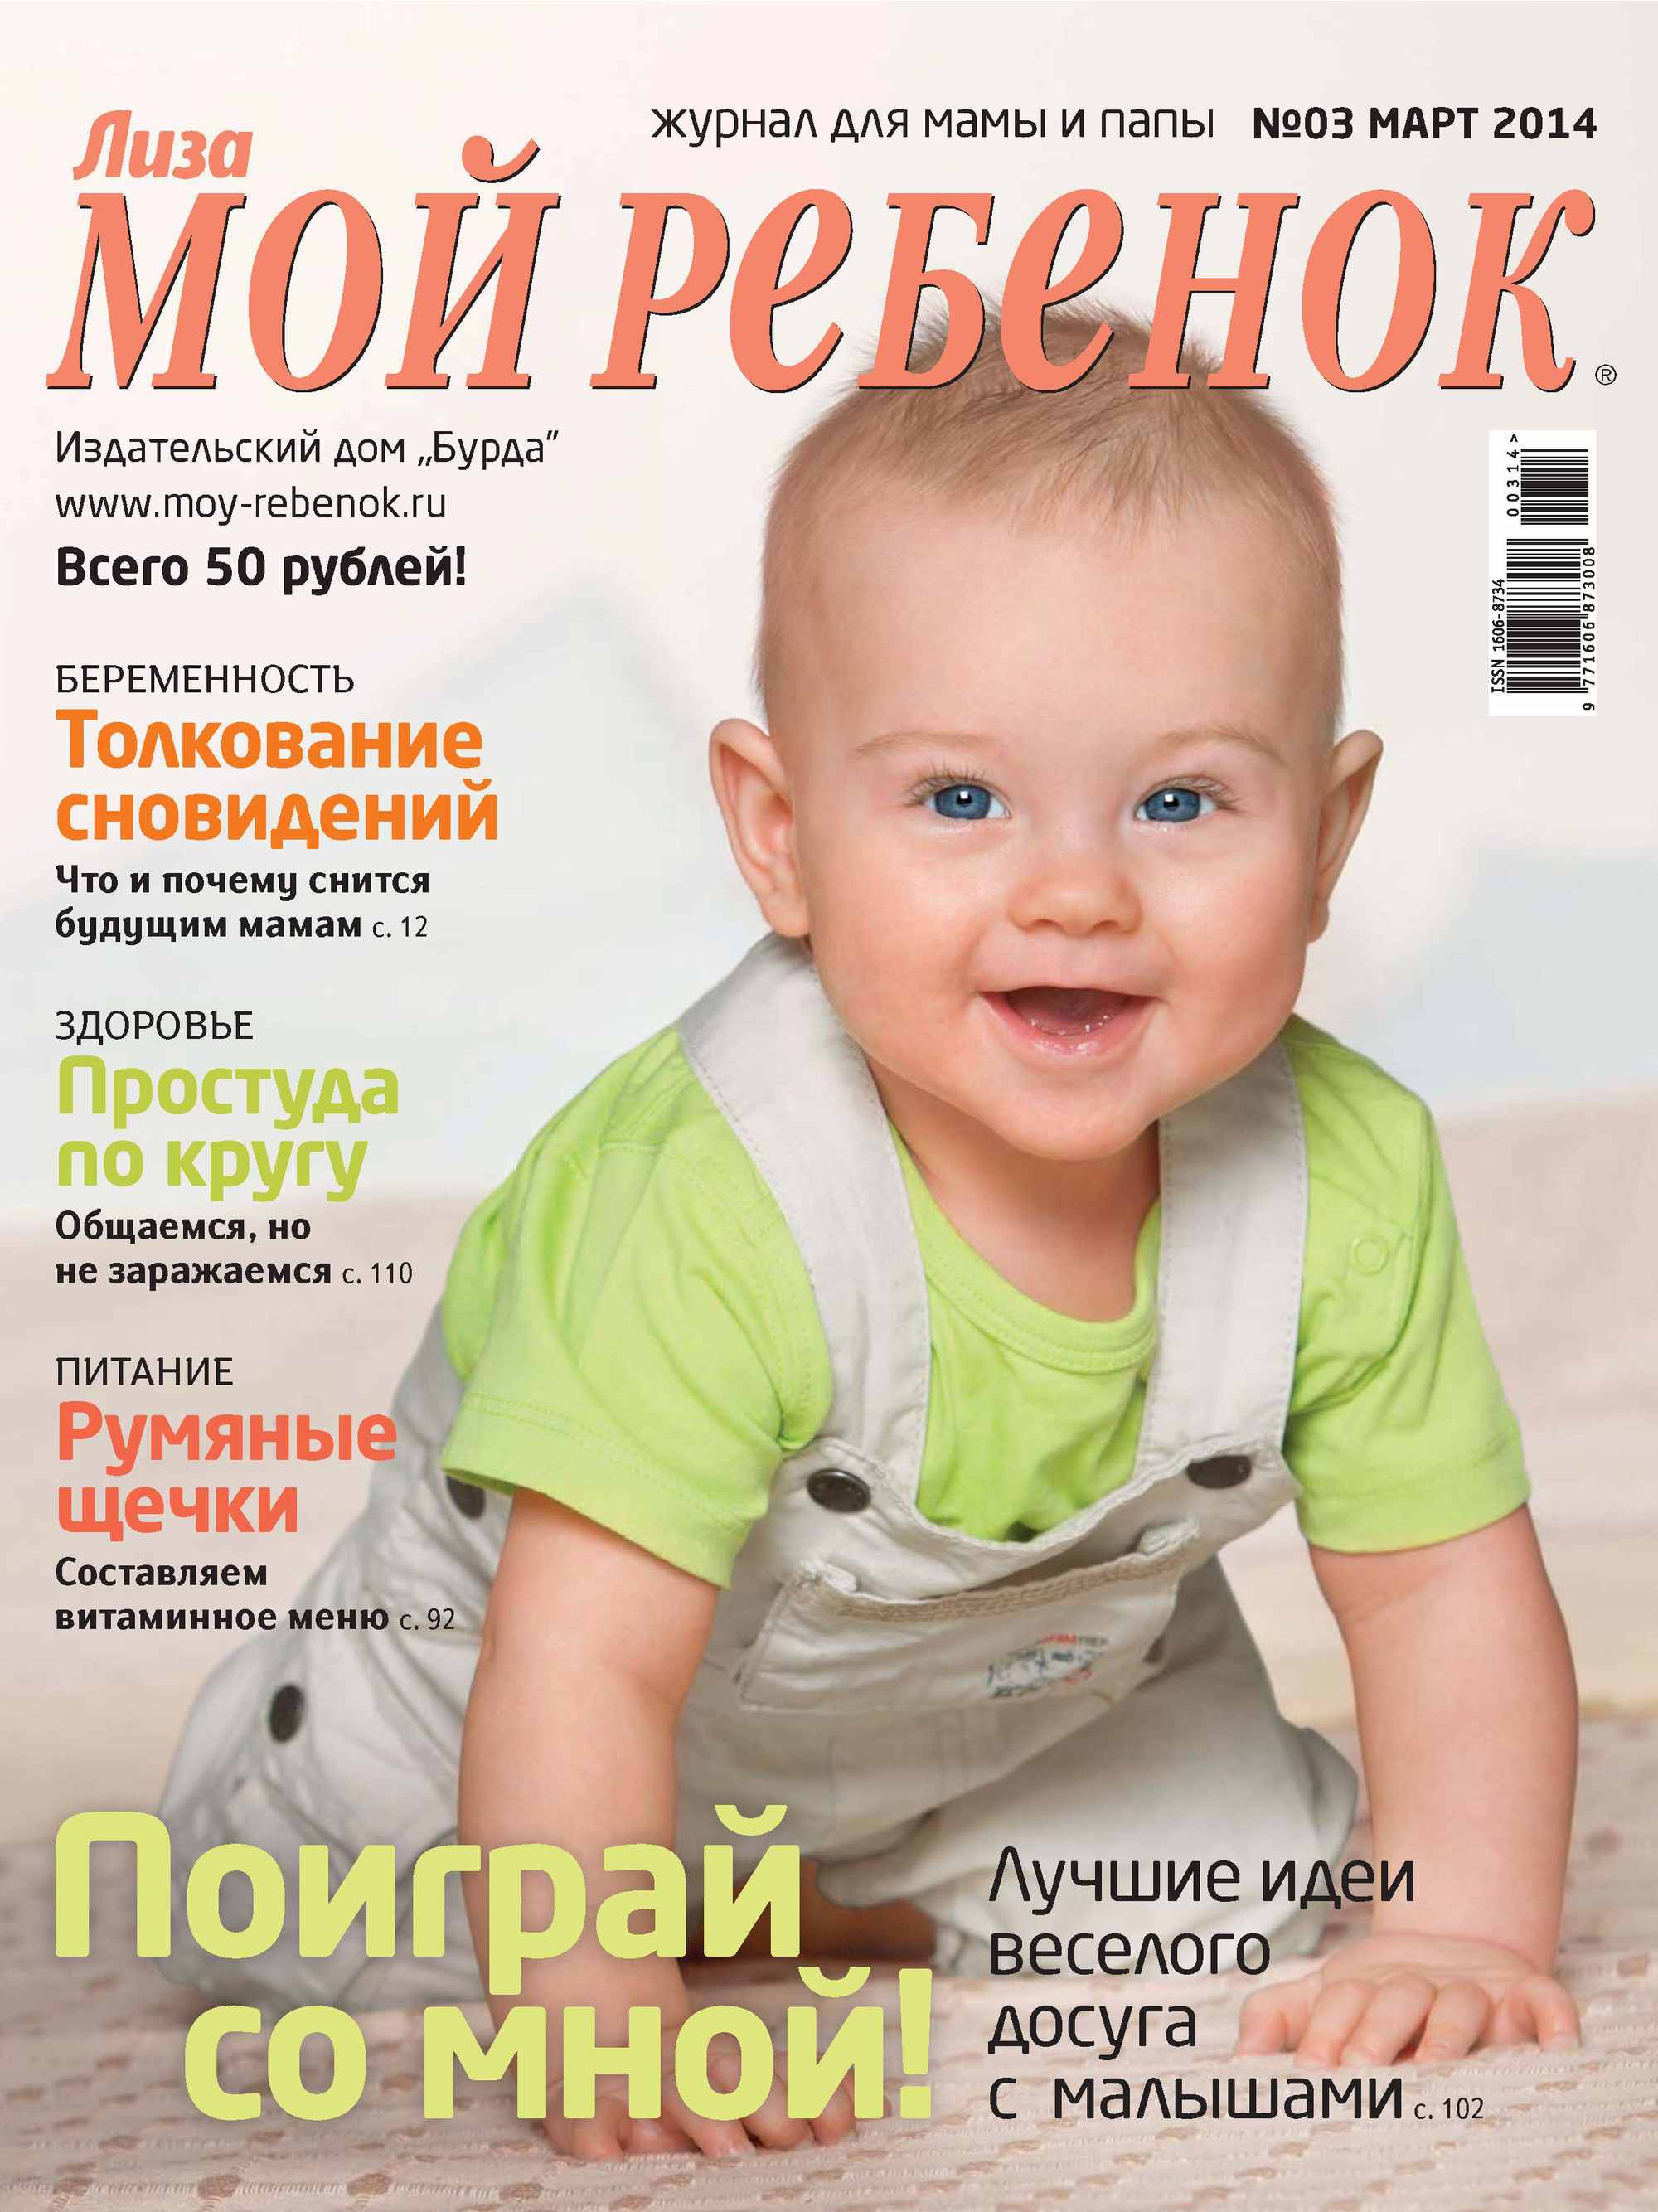 ИД «Бурда» Журнал «Лиза. Мой ребенок» №03/2014 ид бурда журнал лиза мой ребенок 11 2014